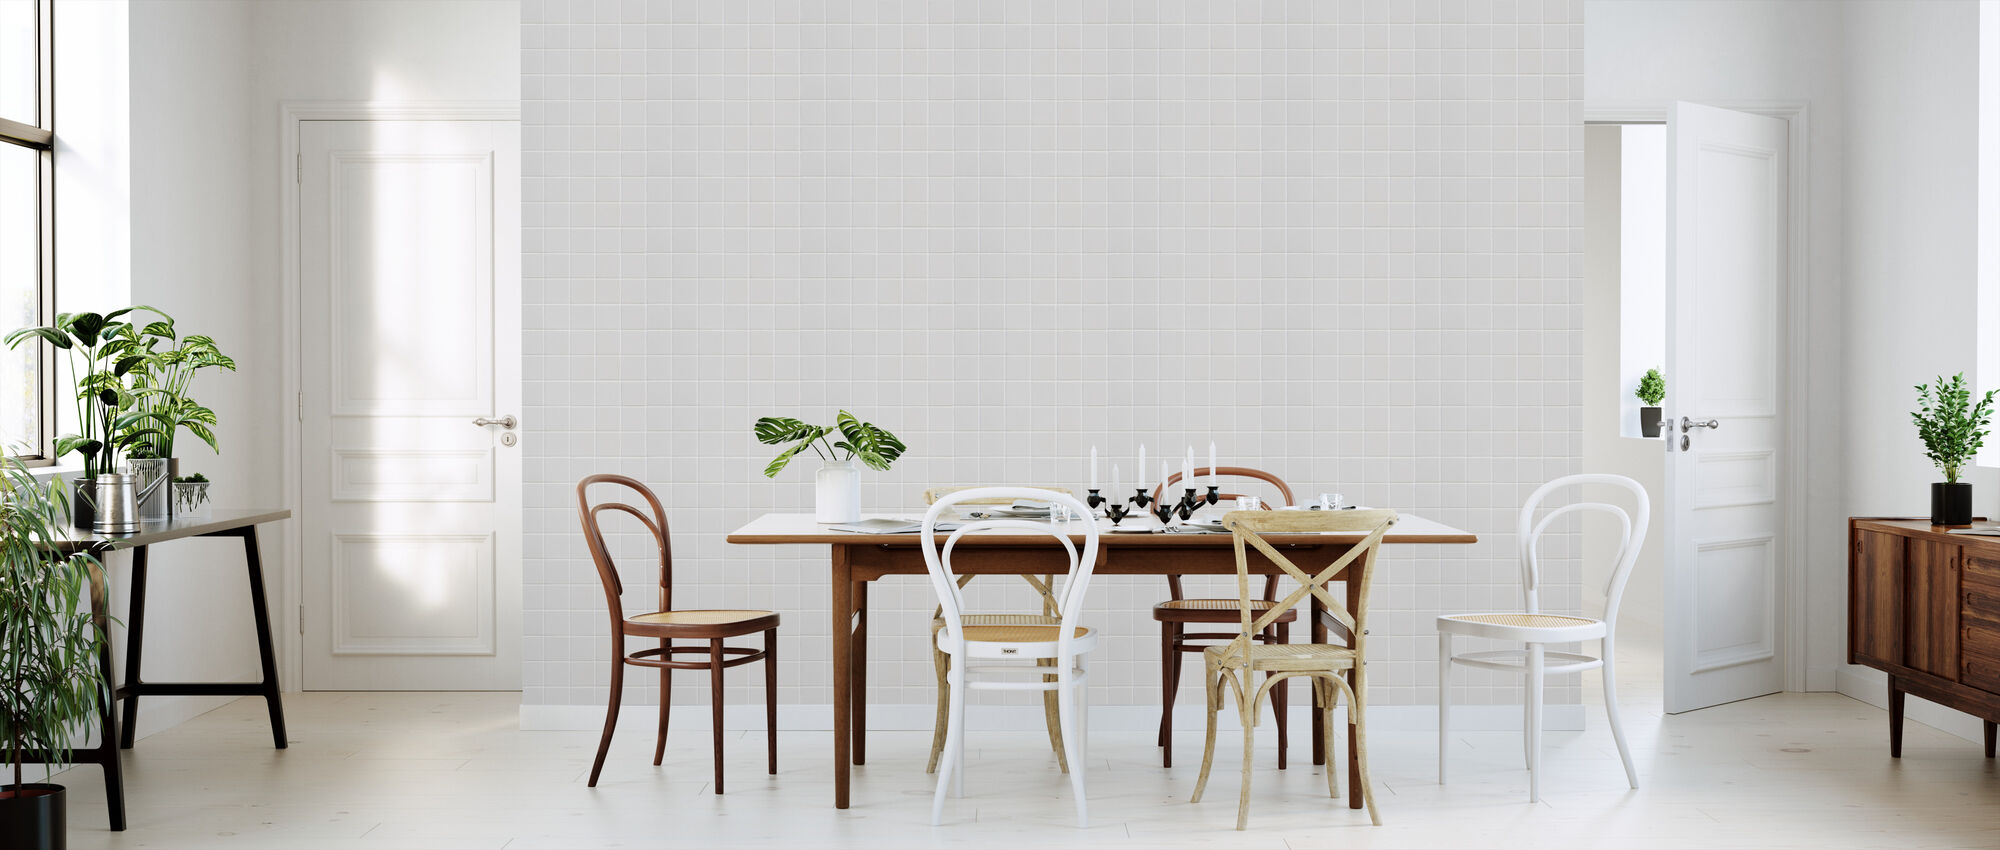 White Ceramic Tiles - 15x15 - Wallpaper - Kitchen